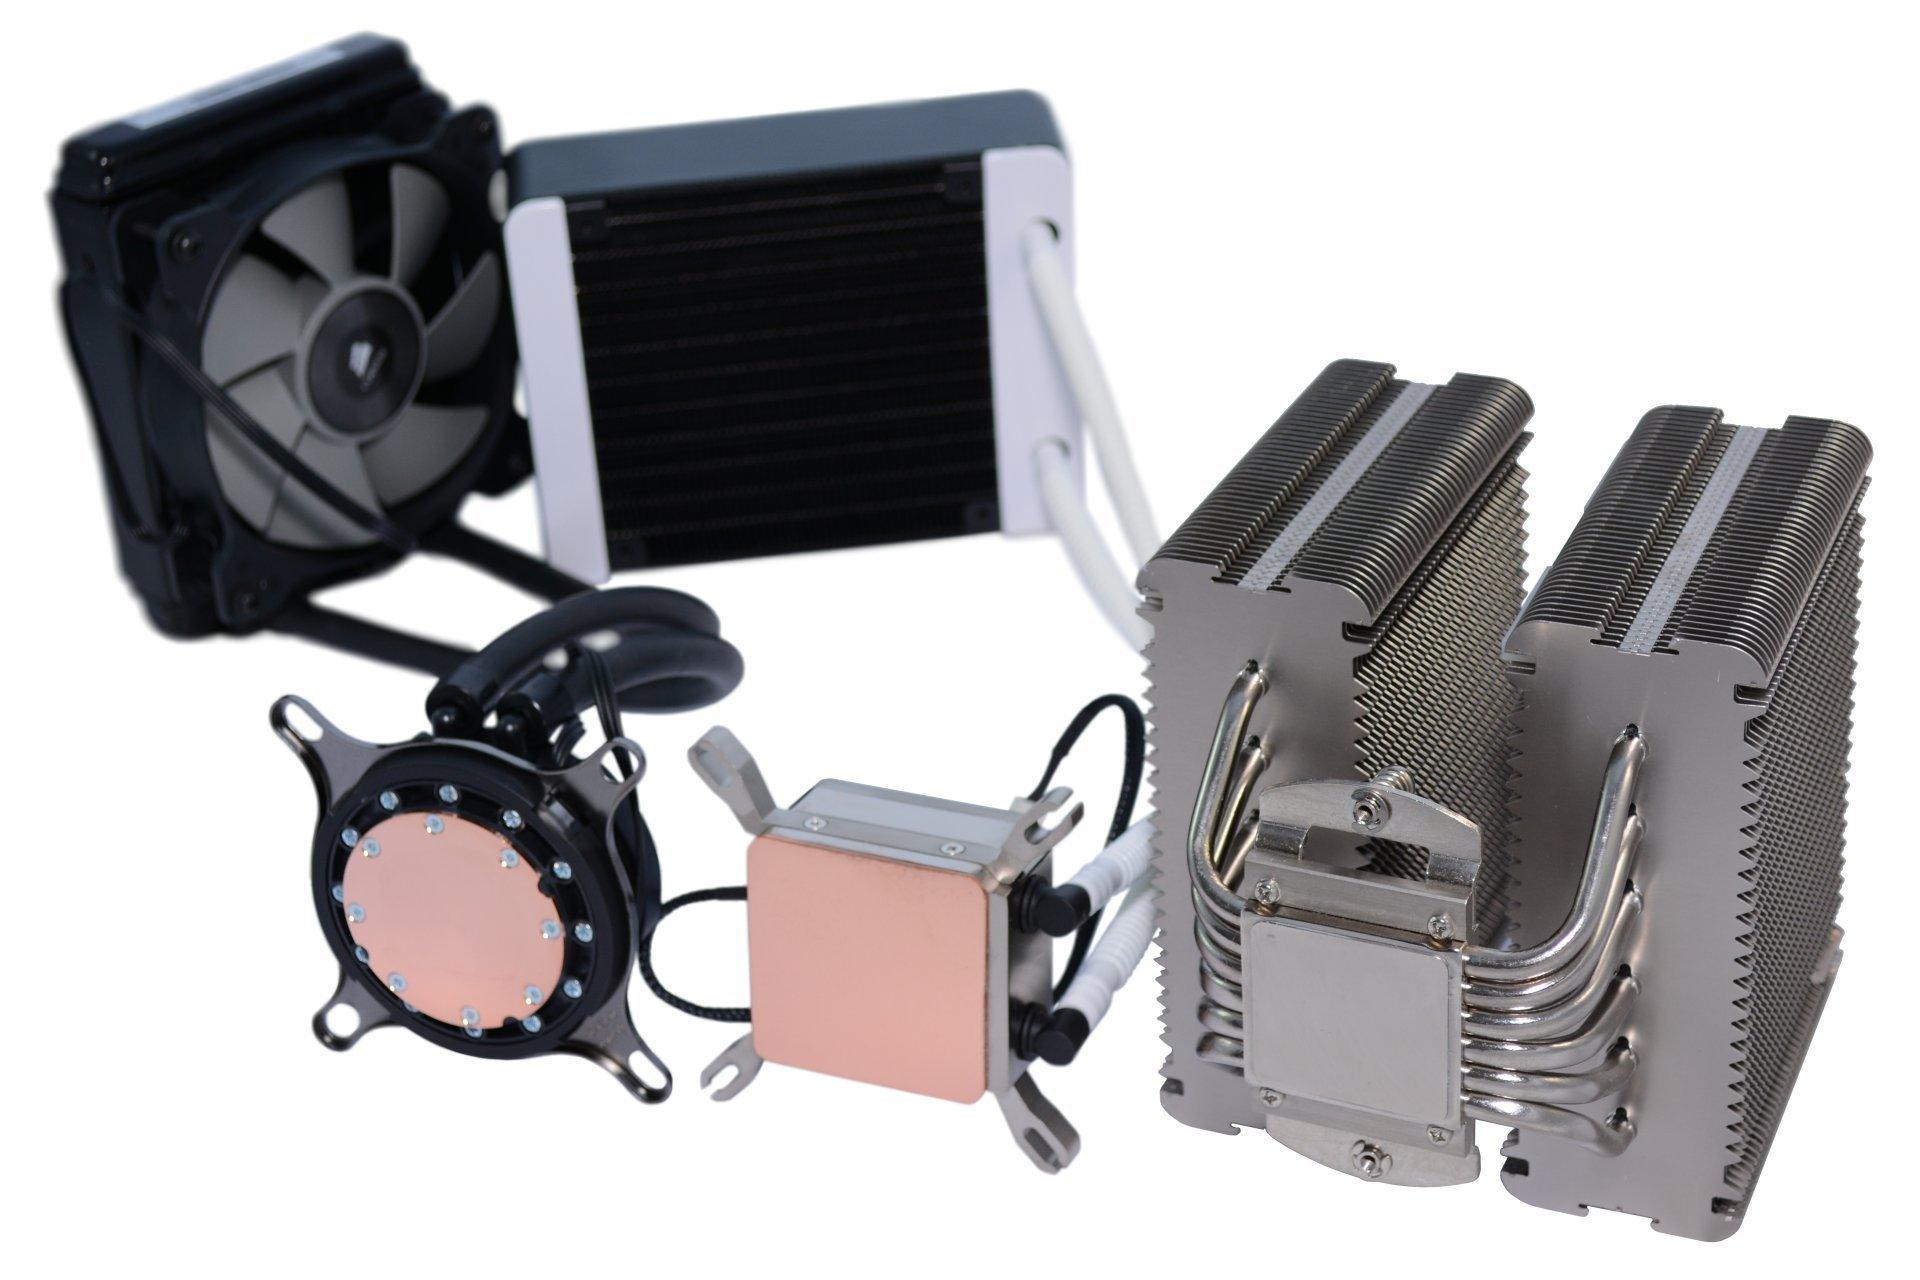 Air To Air Cooling : Aftermarket cpu cooling closed loop water vs air